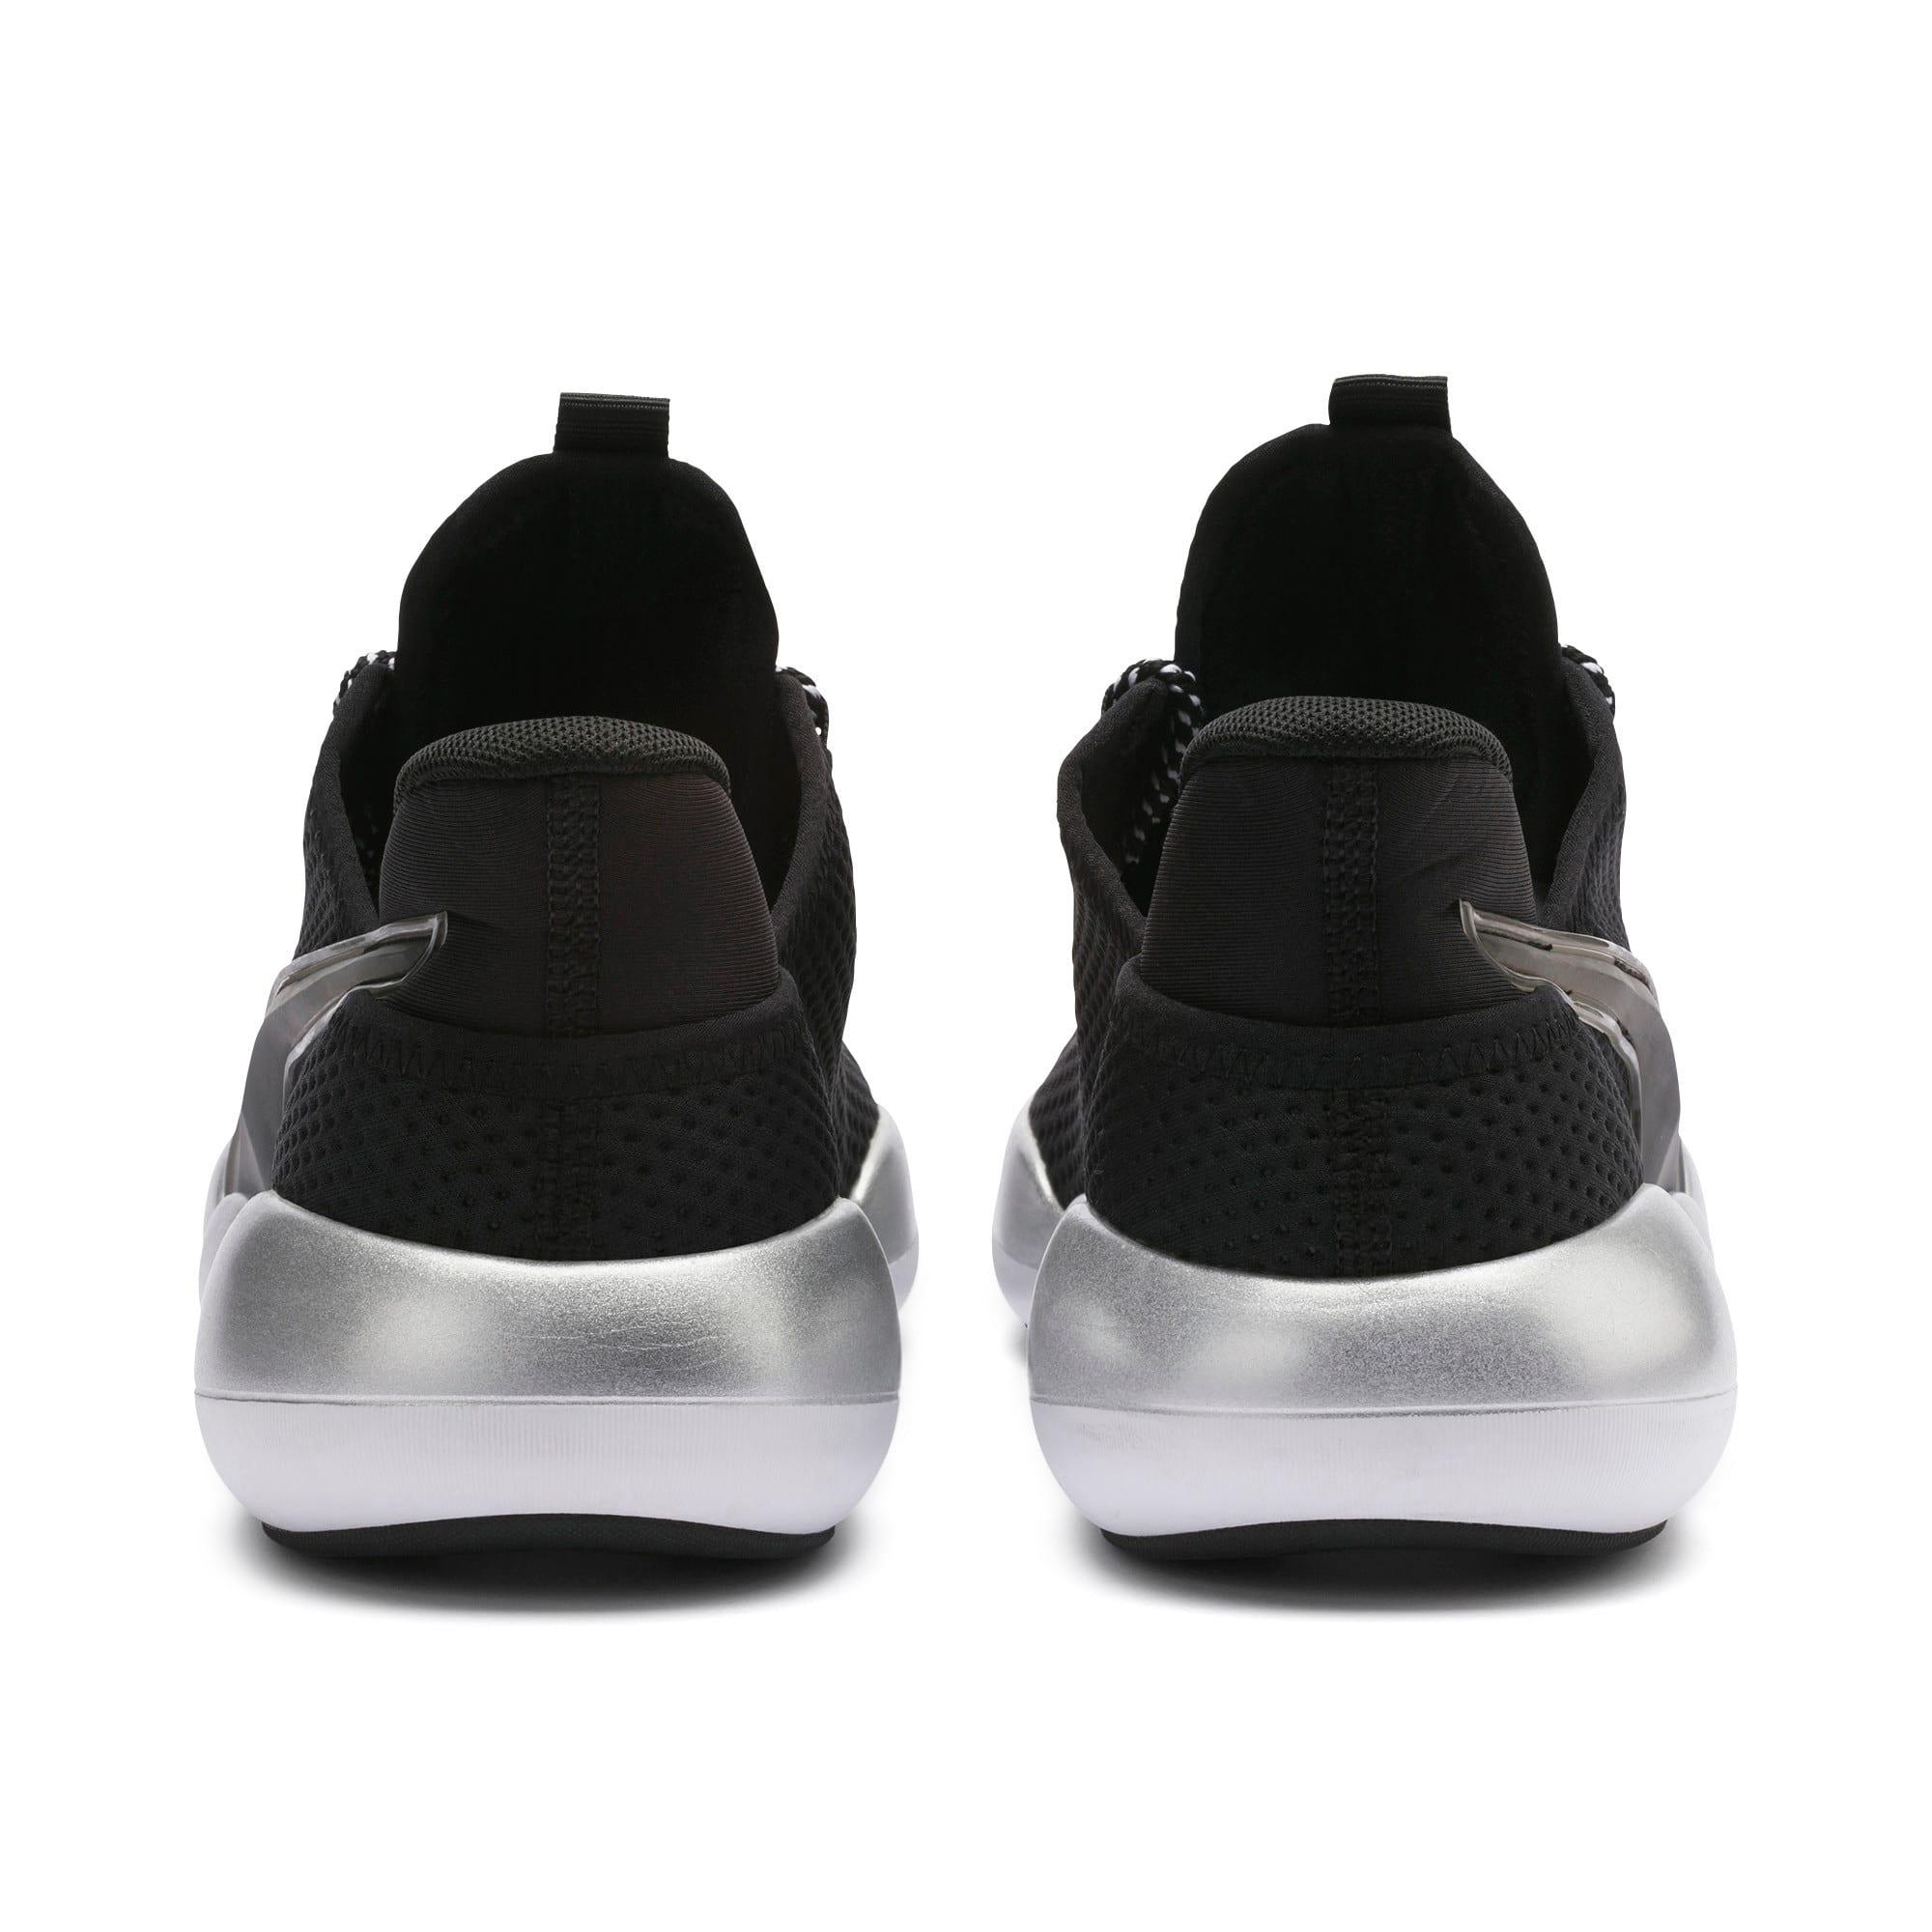 Thumbnail 4 of Mode XT trainingssneakers voor dames, Puma Black-Puma White, medium